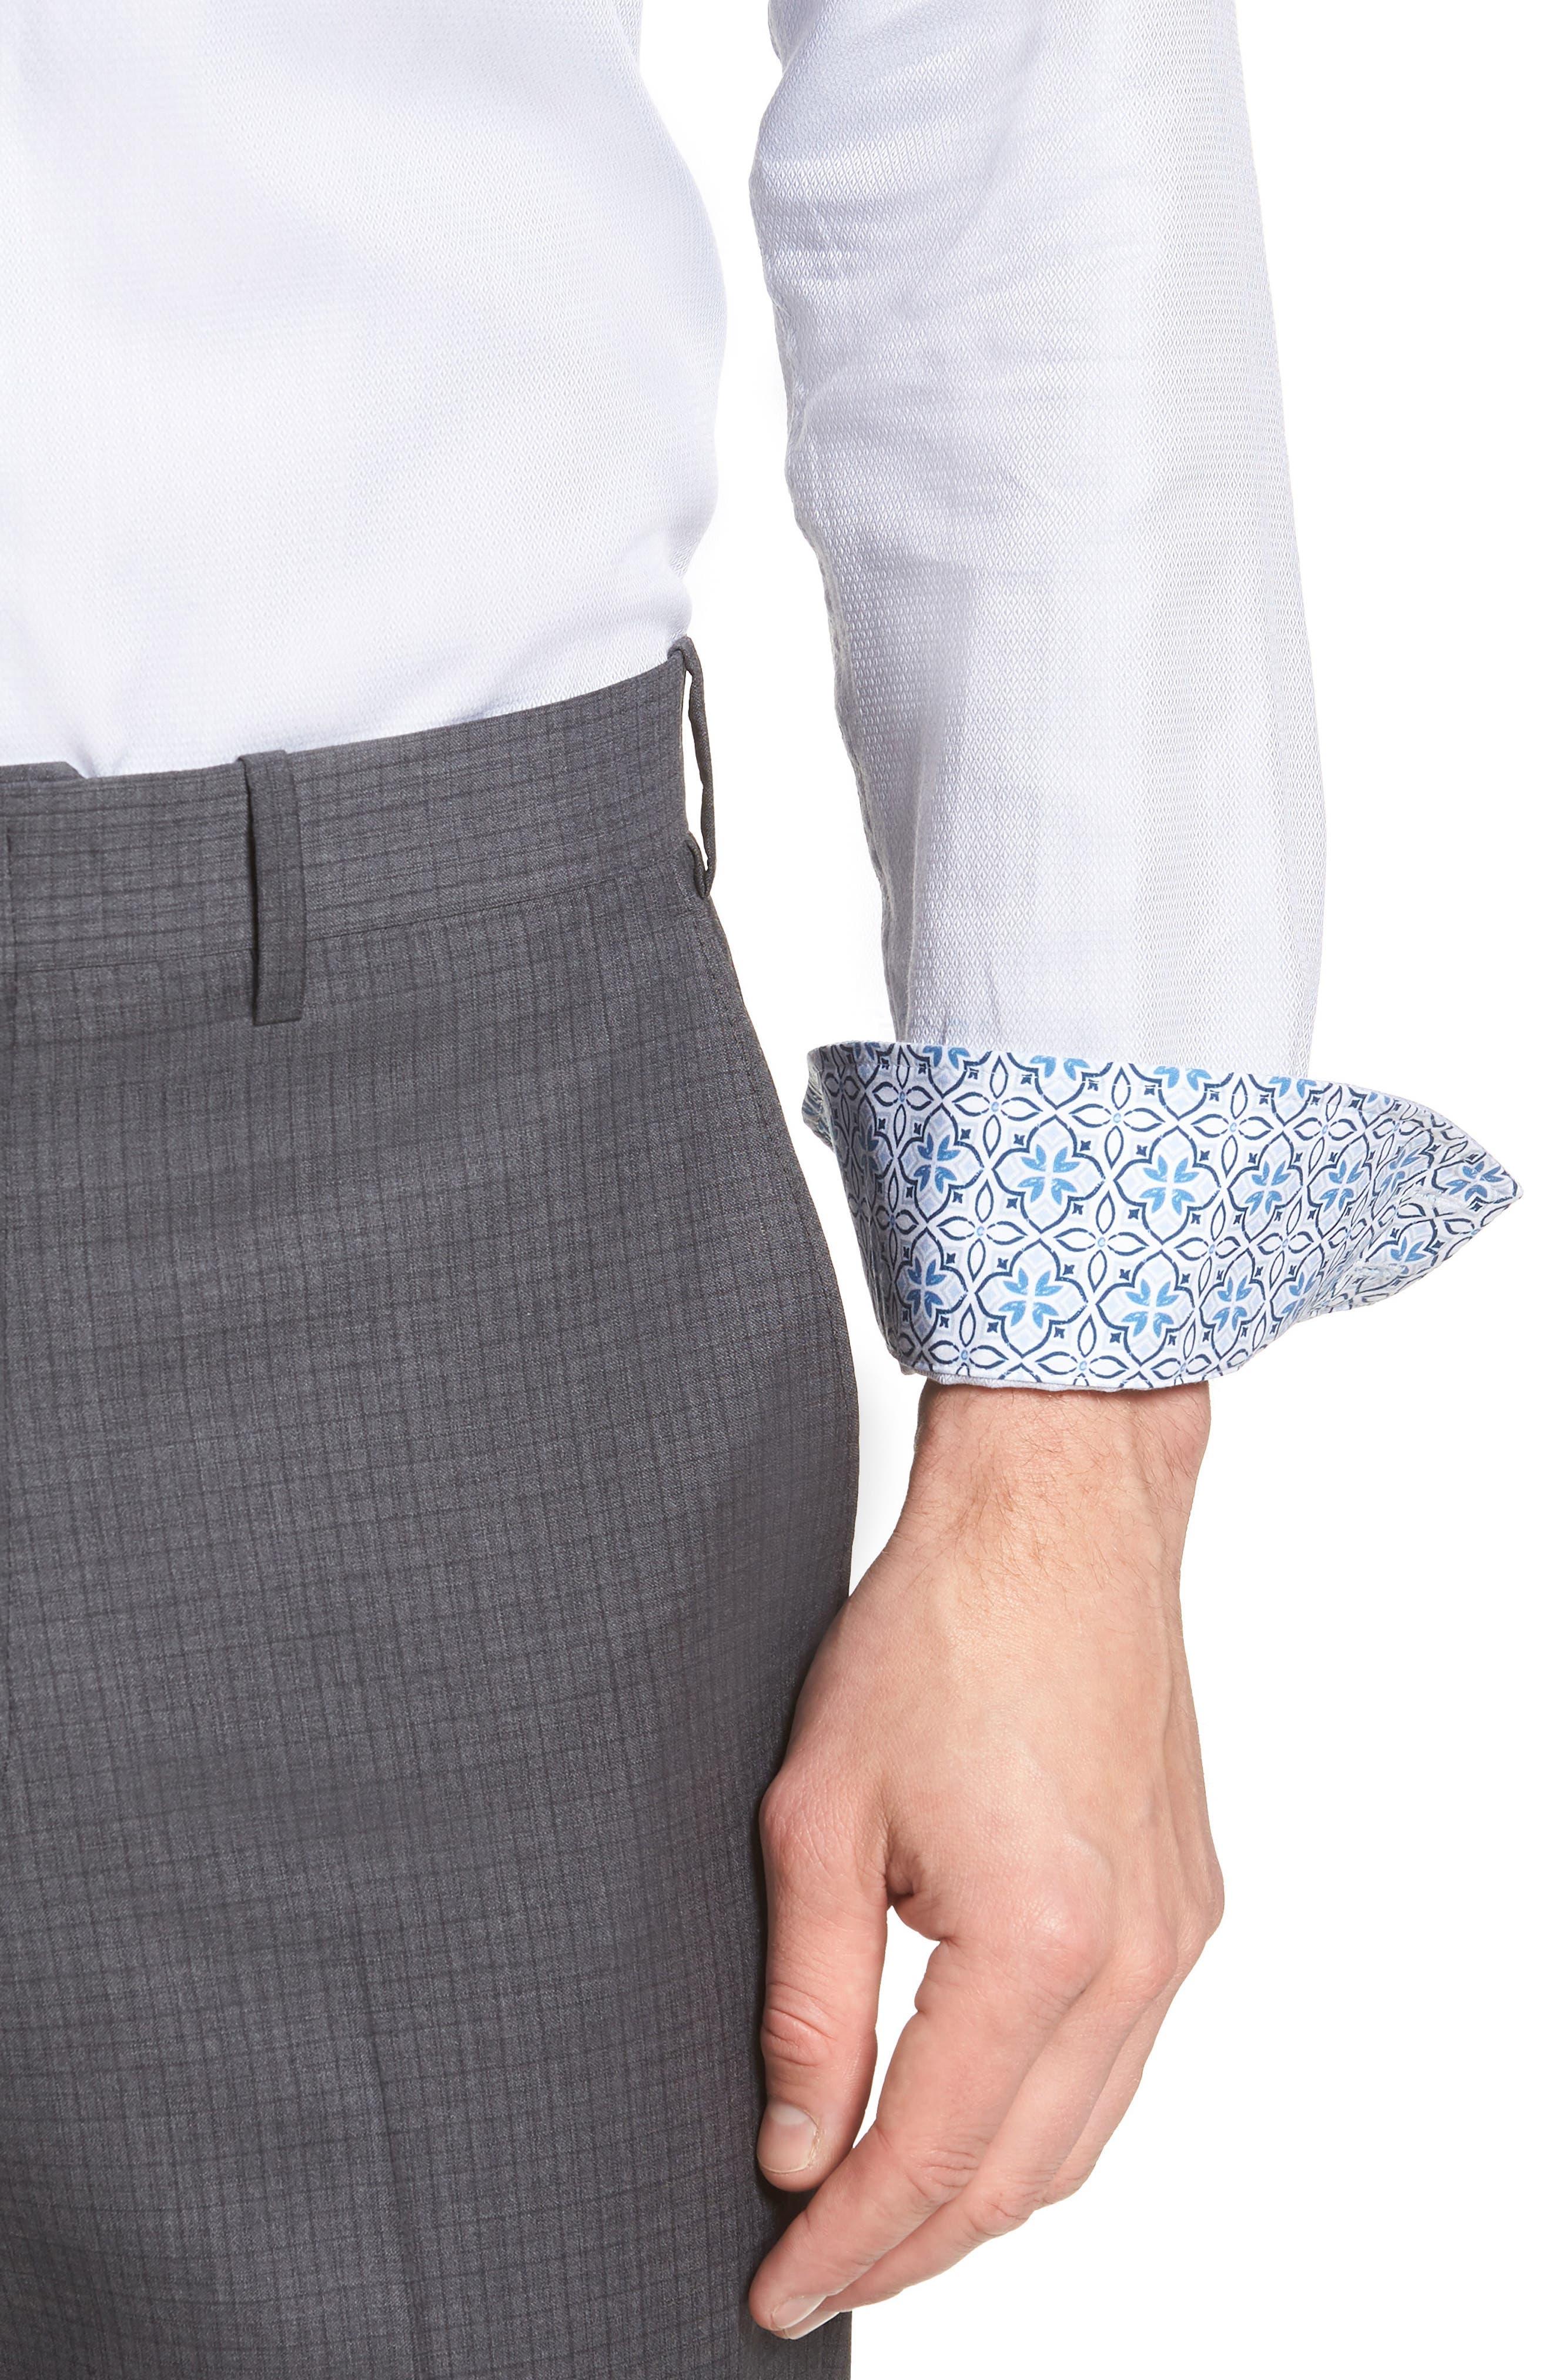 Ollyox Slim Fit Solid Dress Shirt,                             Alternate thumbnail 2, color,                             GREY